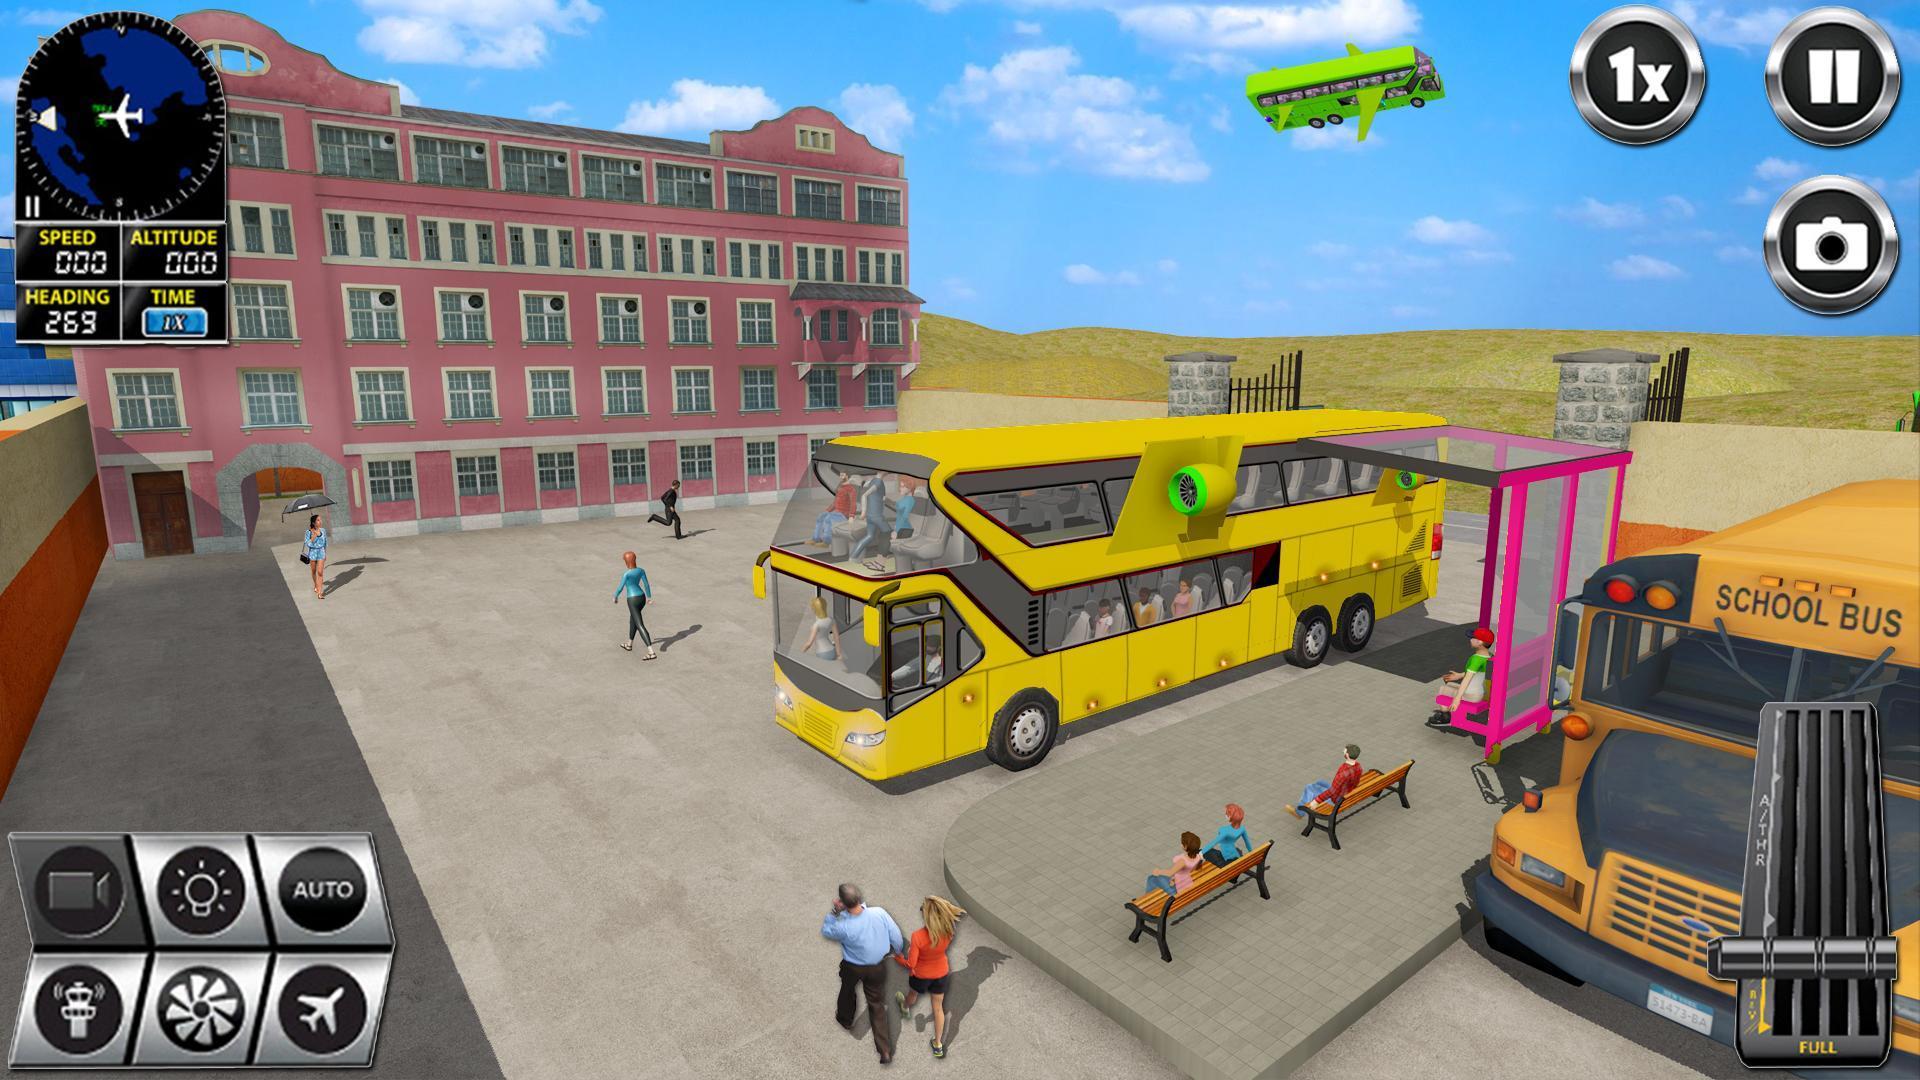 Flying Bus Driving simulator 2019: Free Bus Games 2.8 Screenshot 17